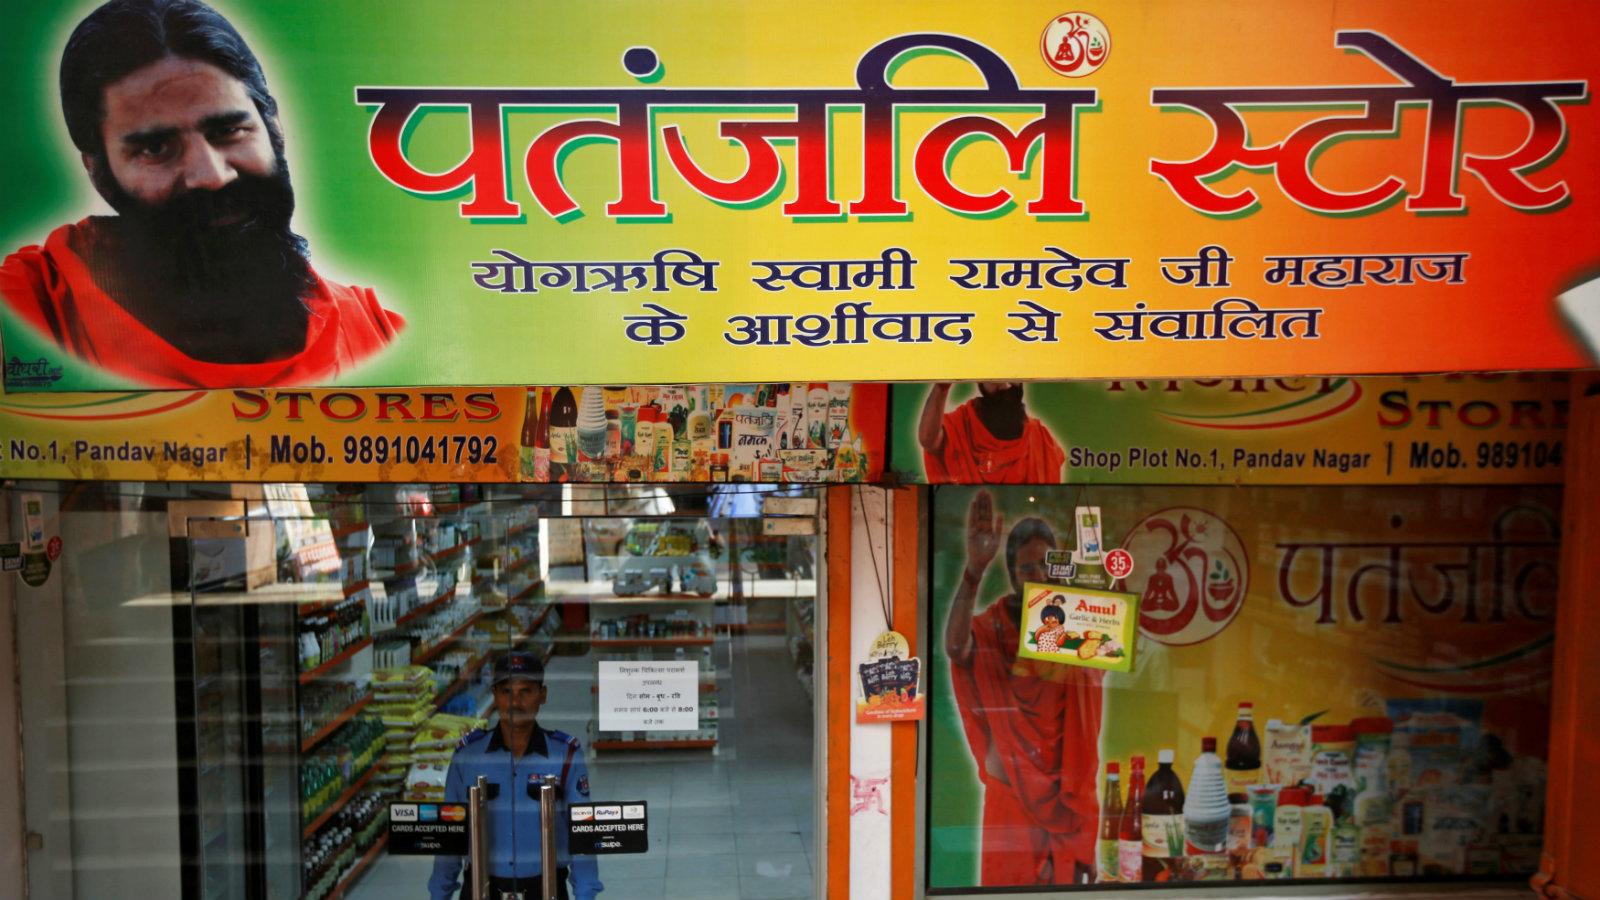 Patanjali-India-Ayurveda-health-food